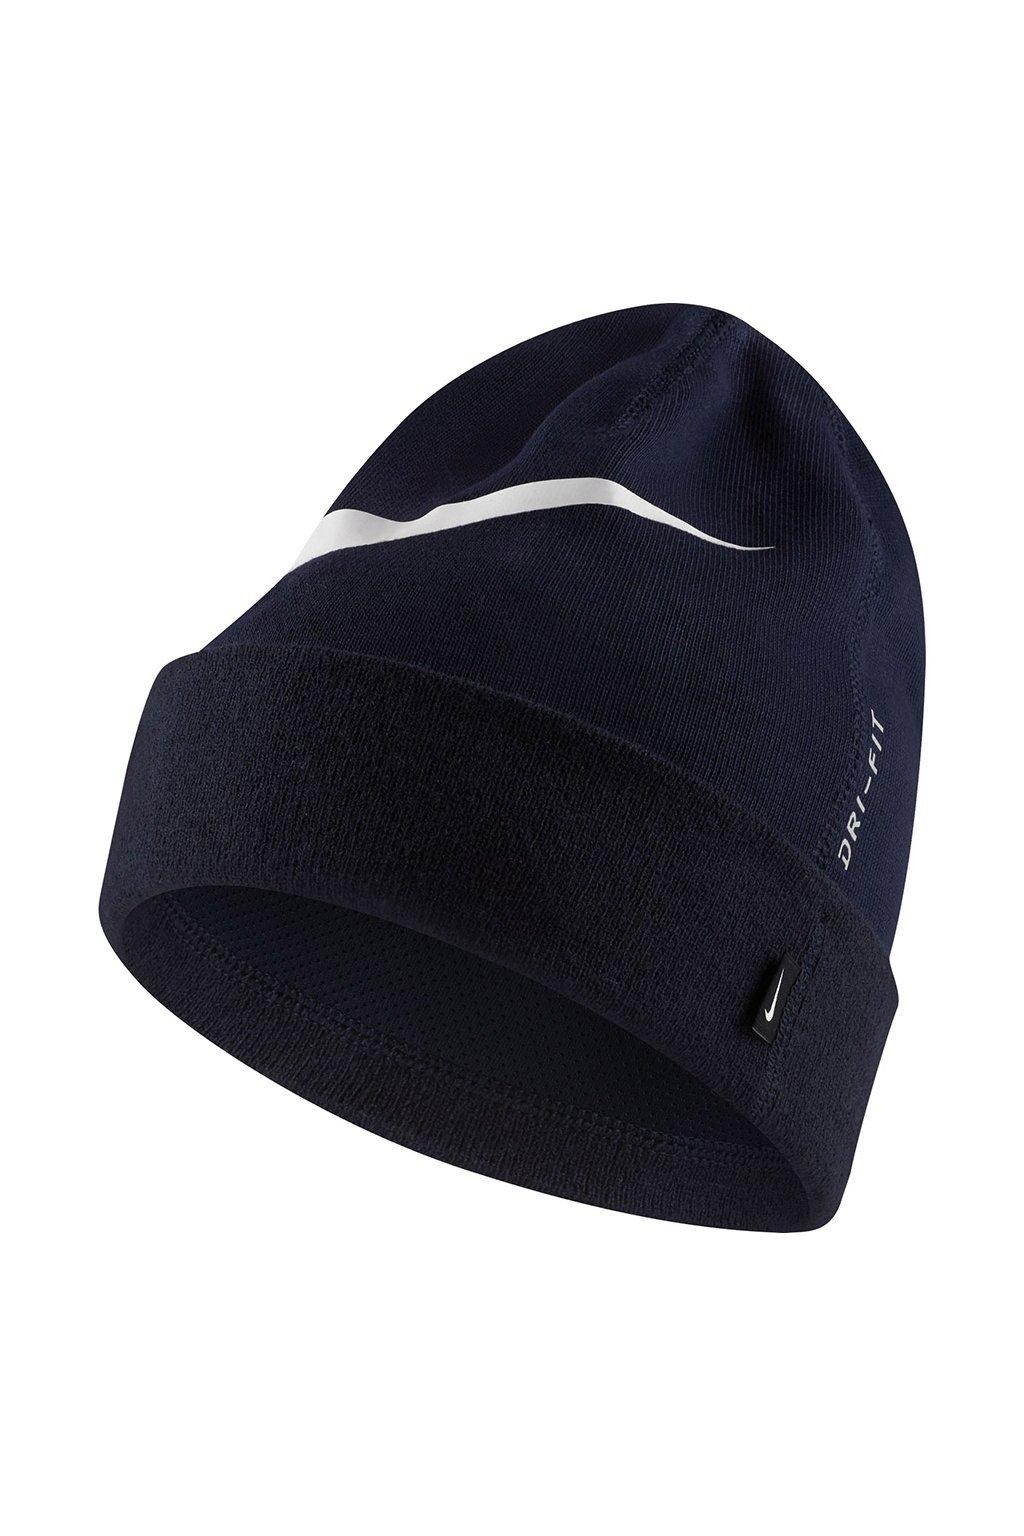 Čiapka Nike U Beanie GFA Team tmavo modrá AV9751 451